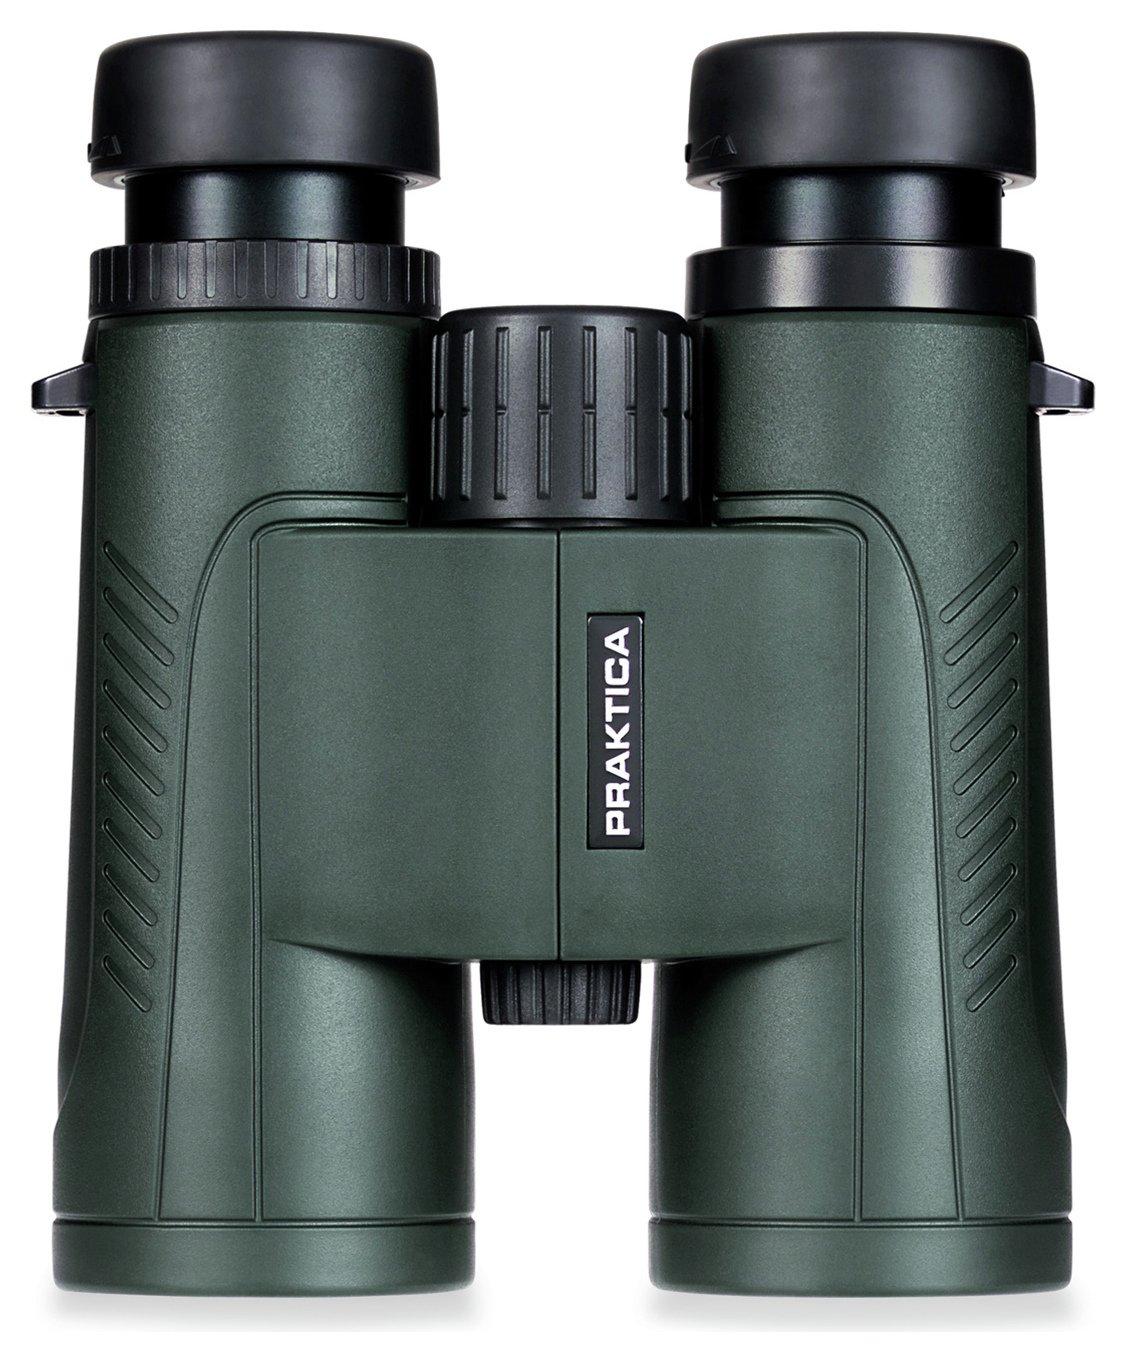 Praktica - Binoculars - Odyssey 10x42mm